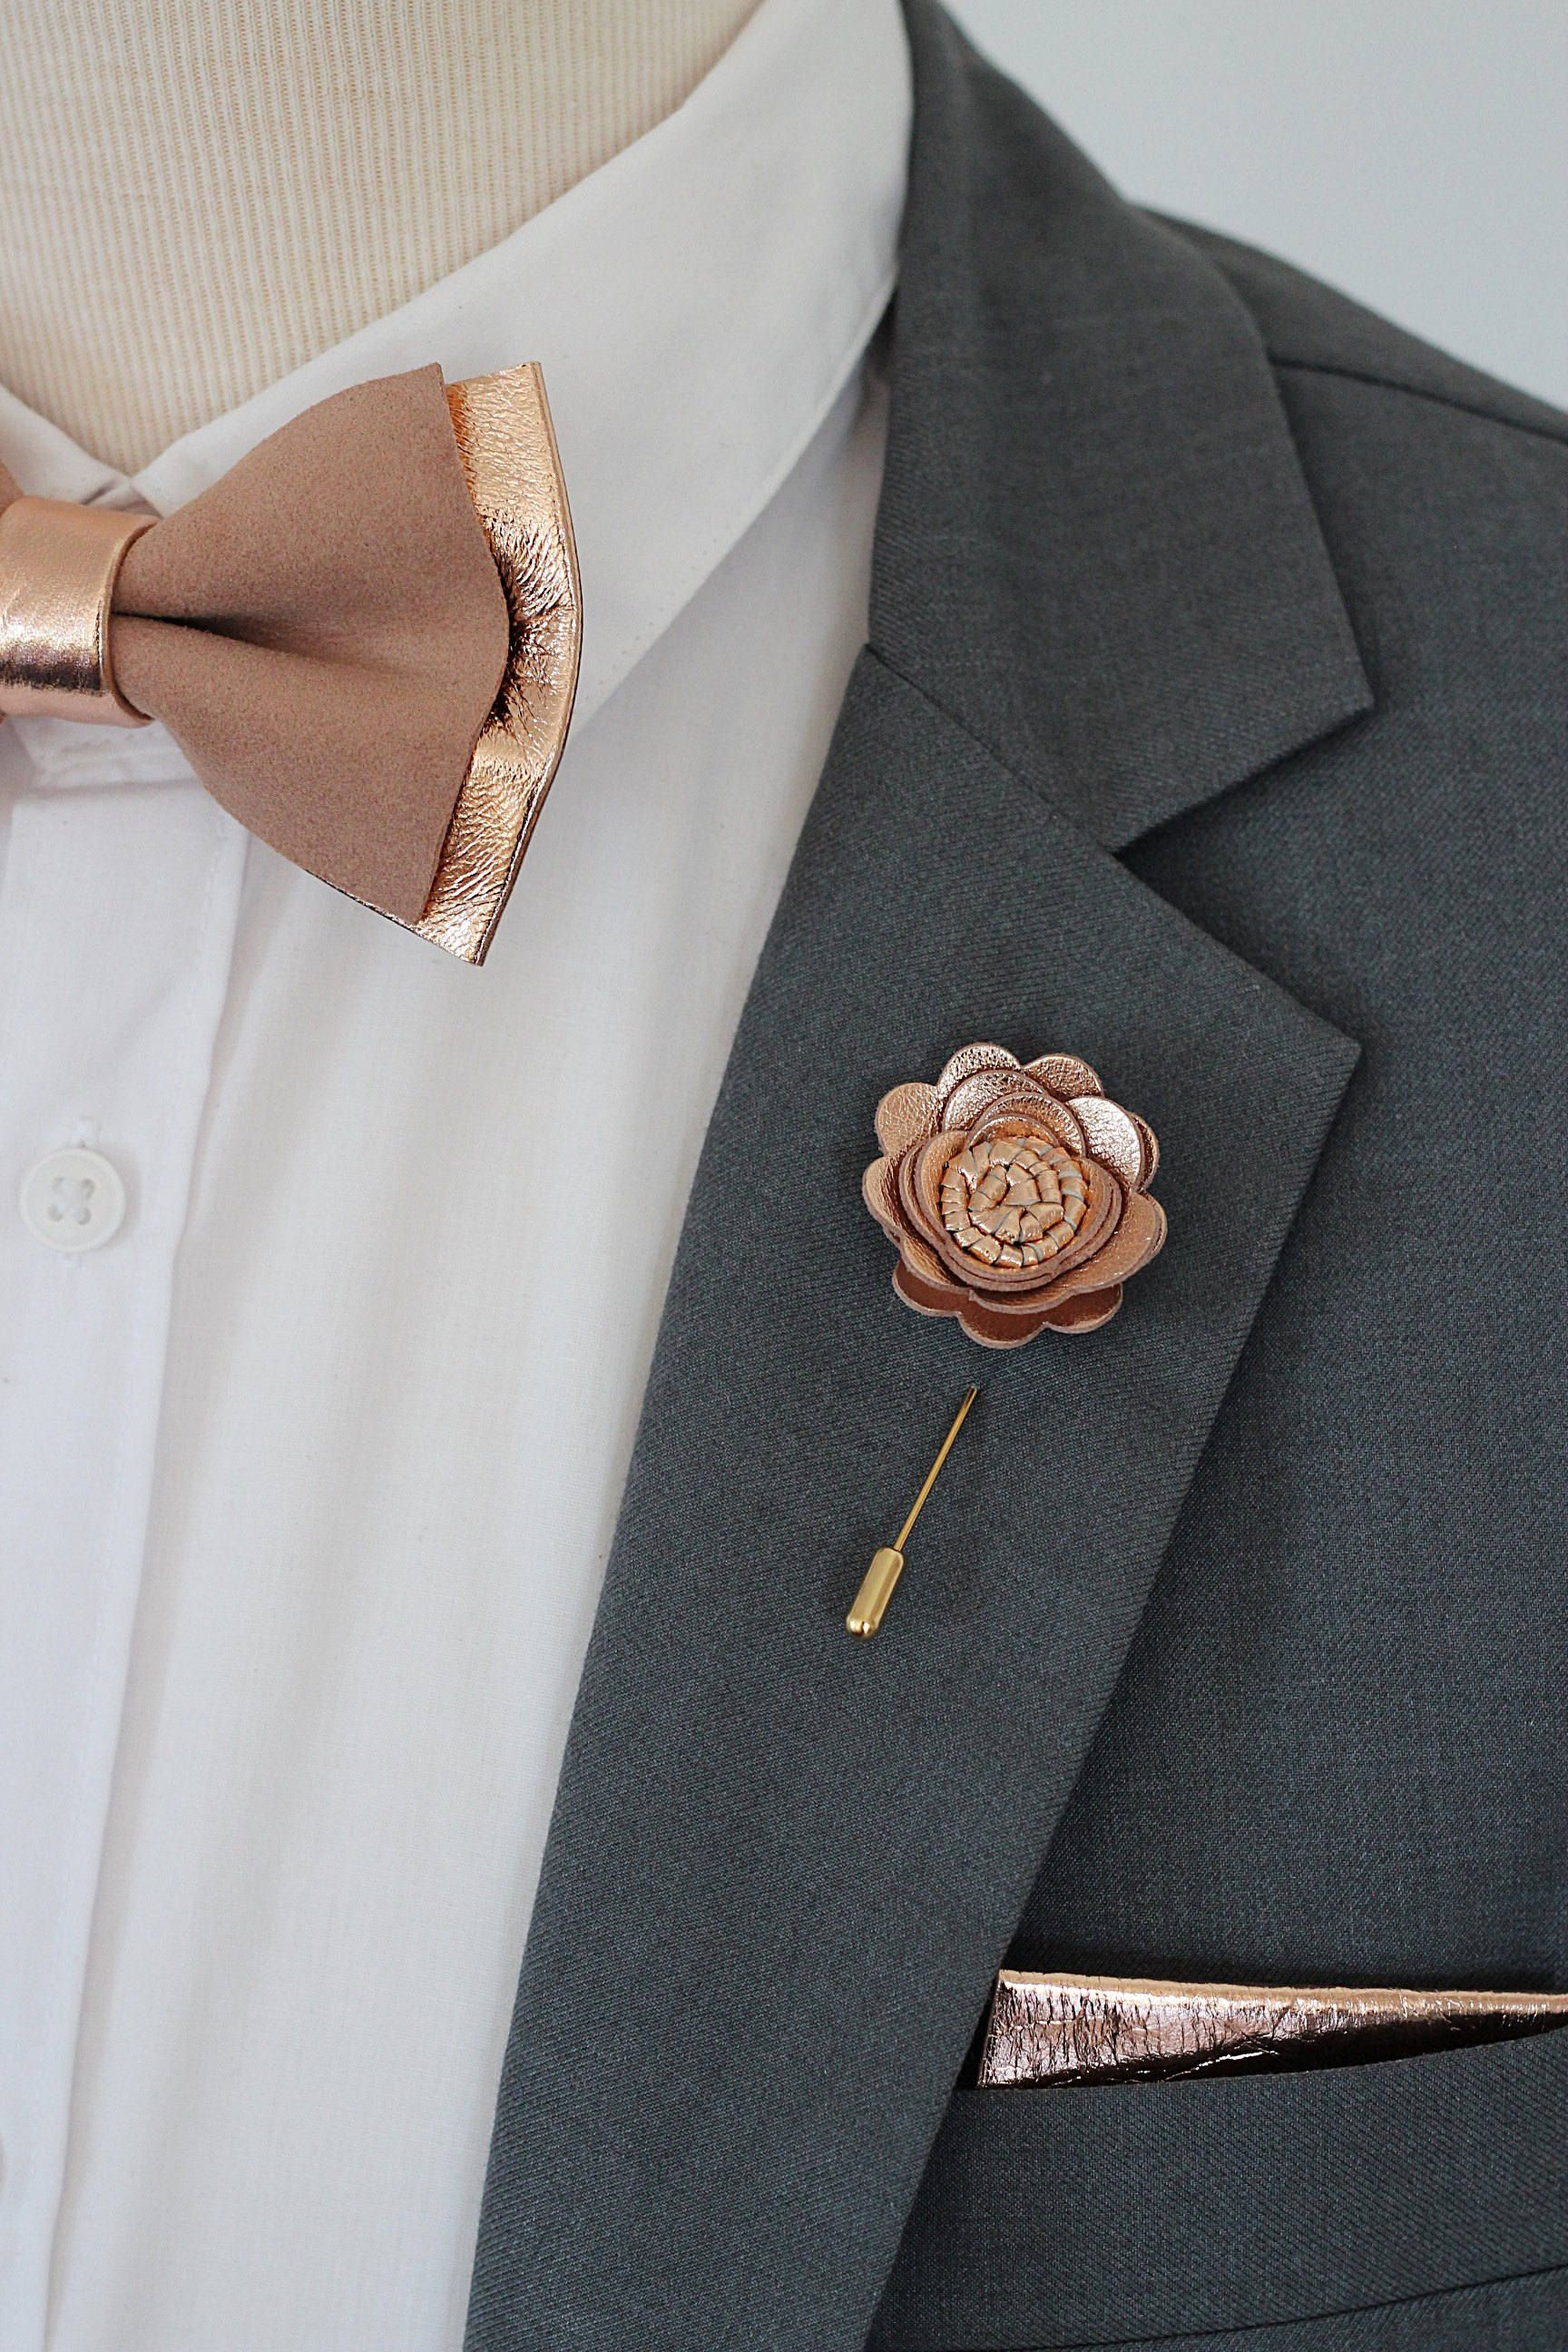 Rose Gold flower lapel pin,bow tie,rose gold wedding ...